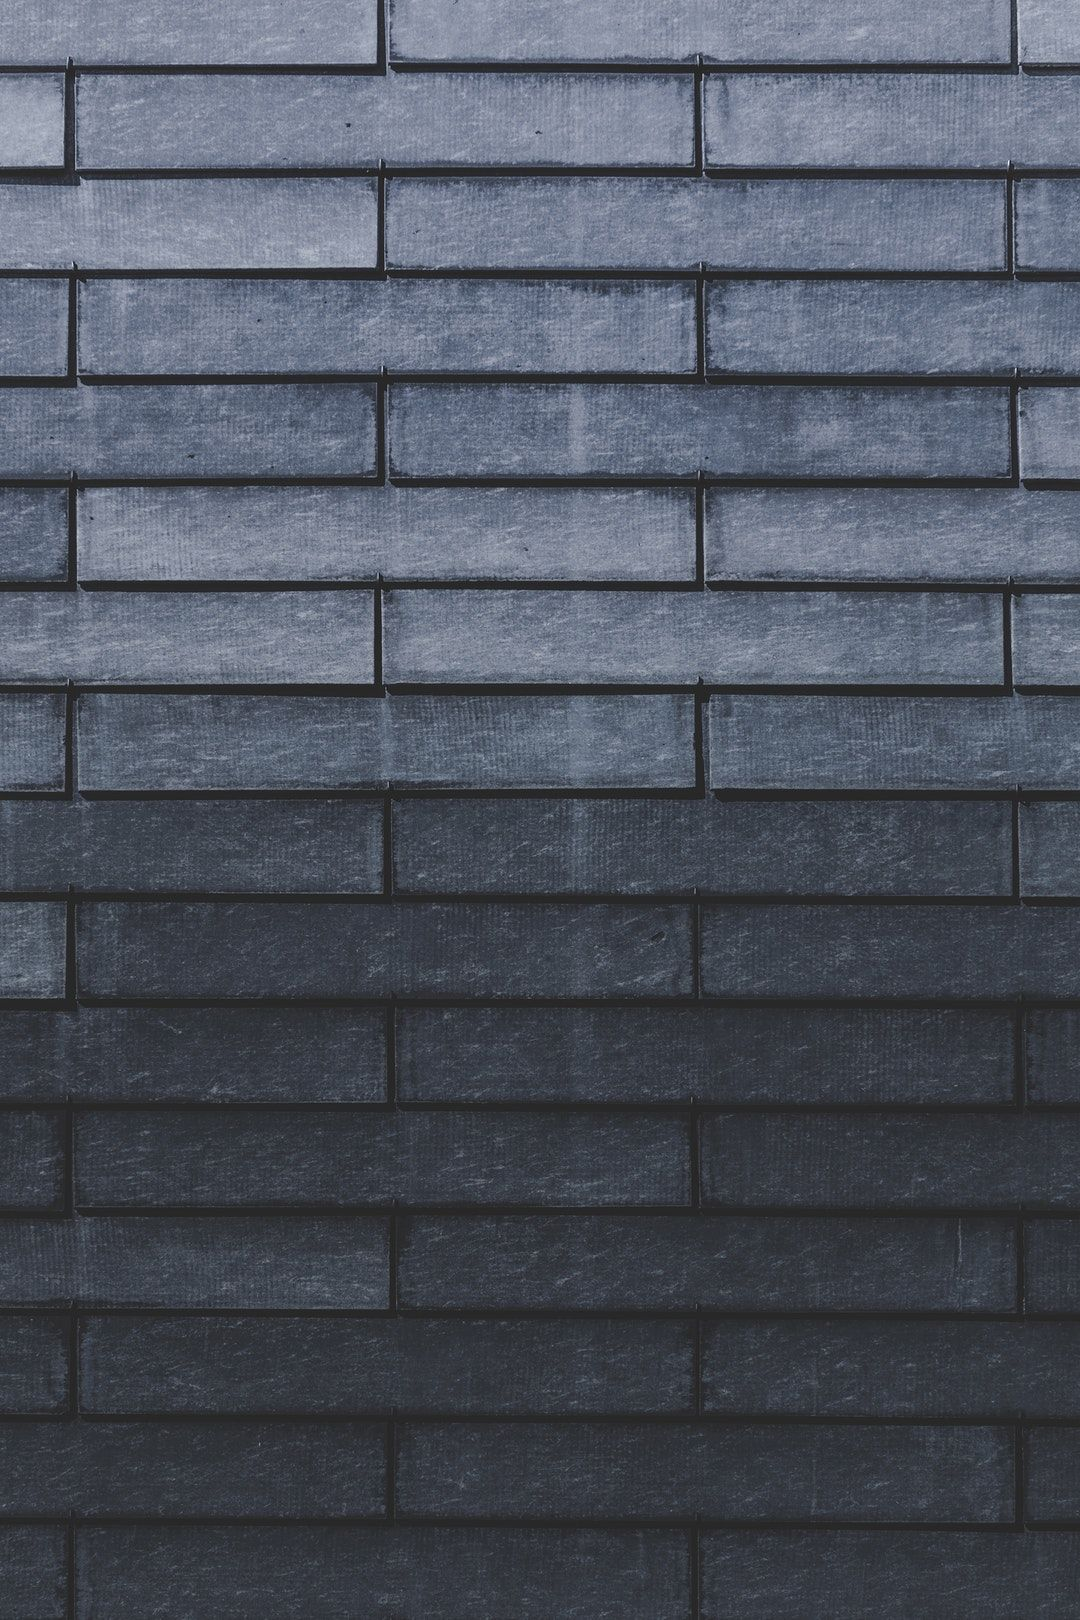 HD wallpaper: texture, textured, portrait display, vertical, close ... | 1620x1080